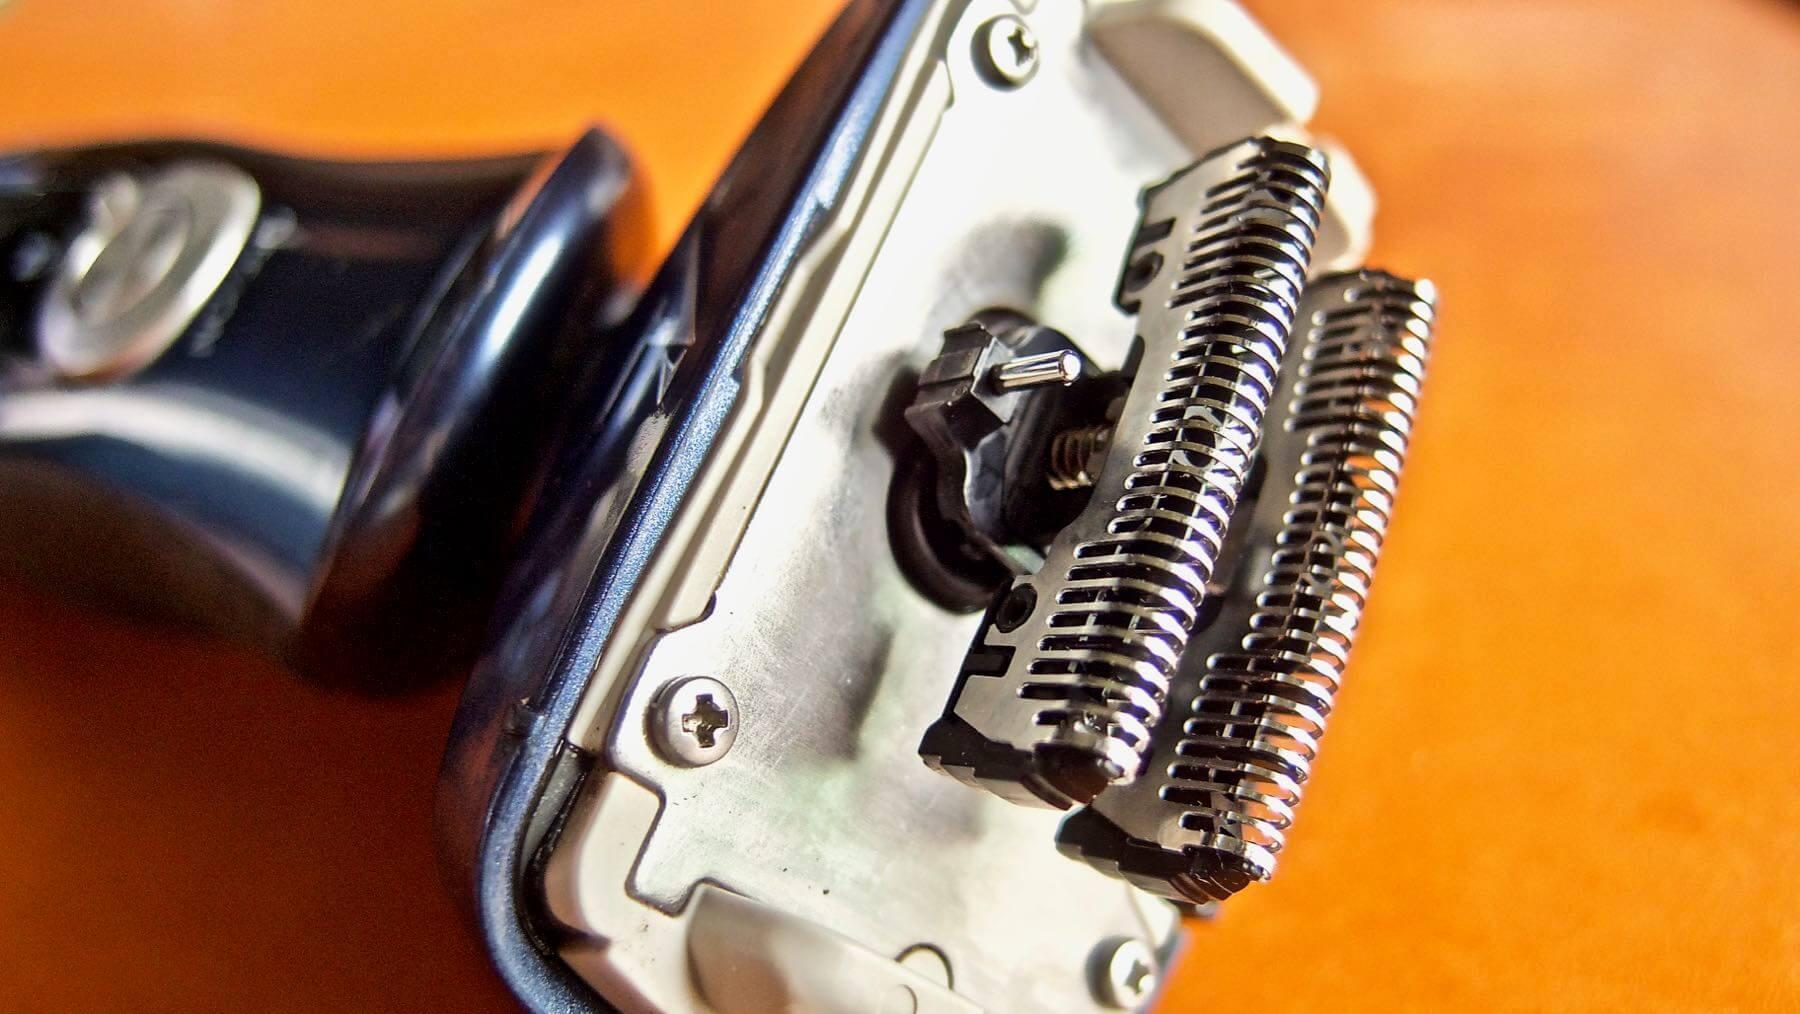 03 LAMDASH ES LV72 Inner blade